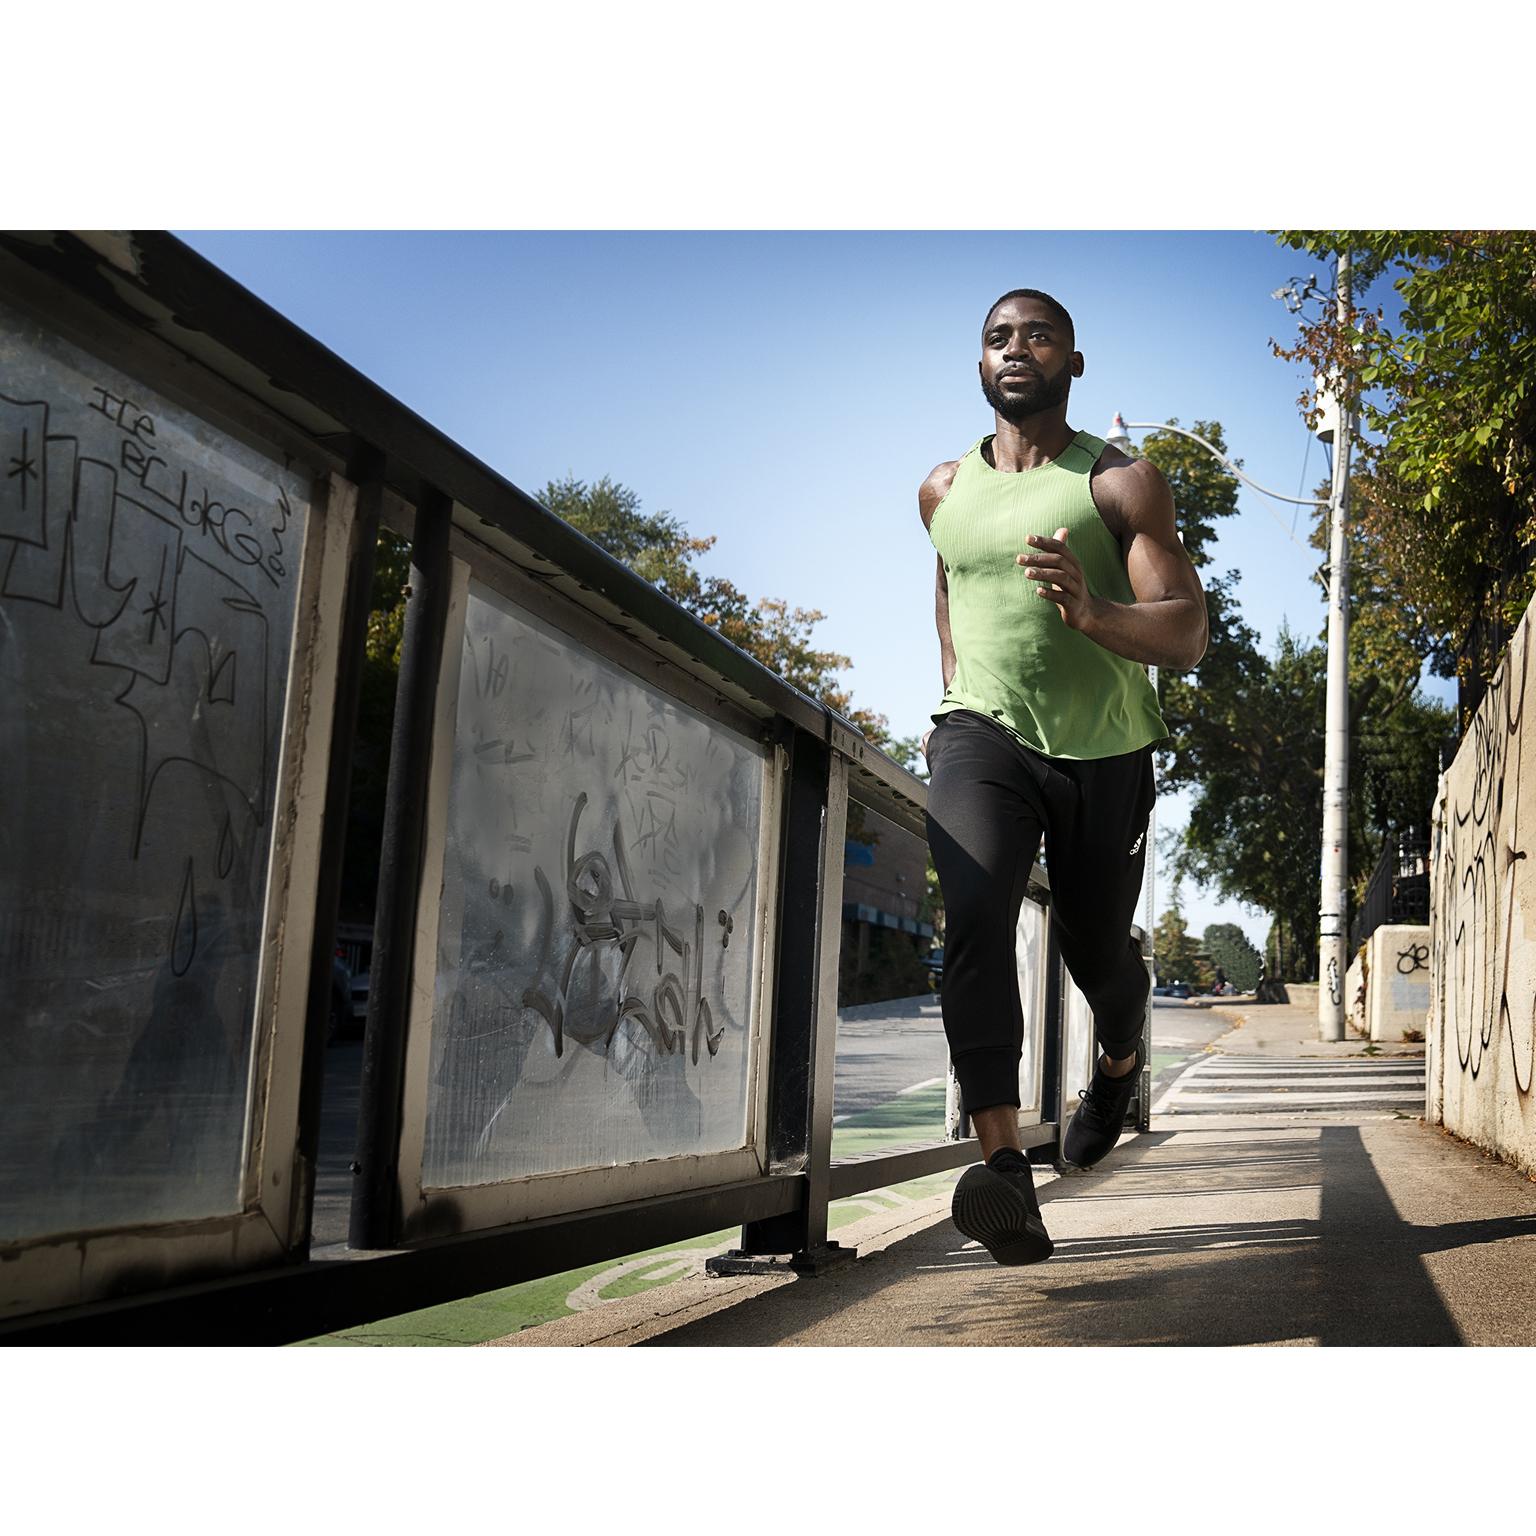 Toronto-Fitness-Model-Agency-Fitness-Casual-Commercial-Perez-Tieku-Fitness-Model-Running